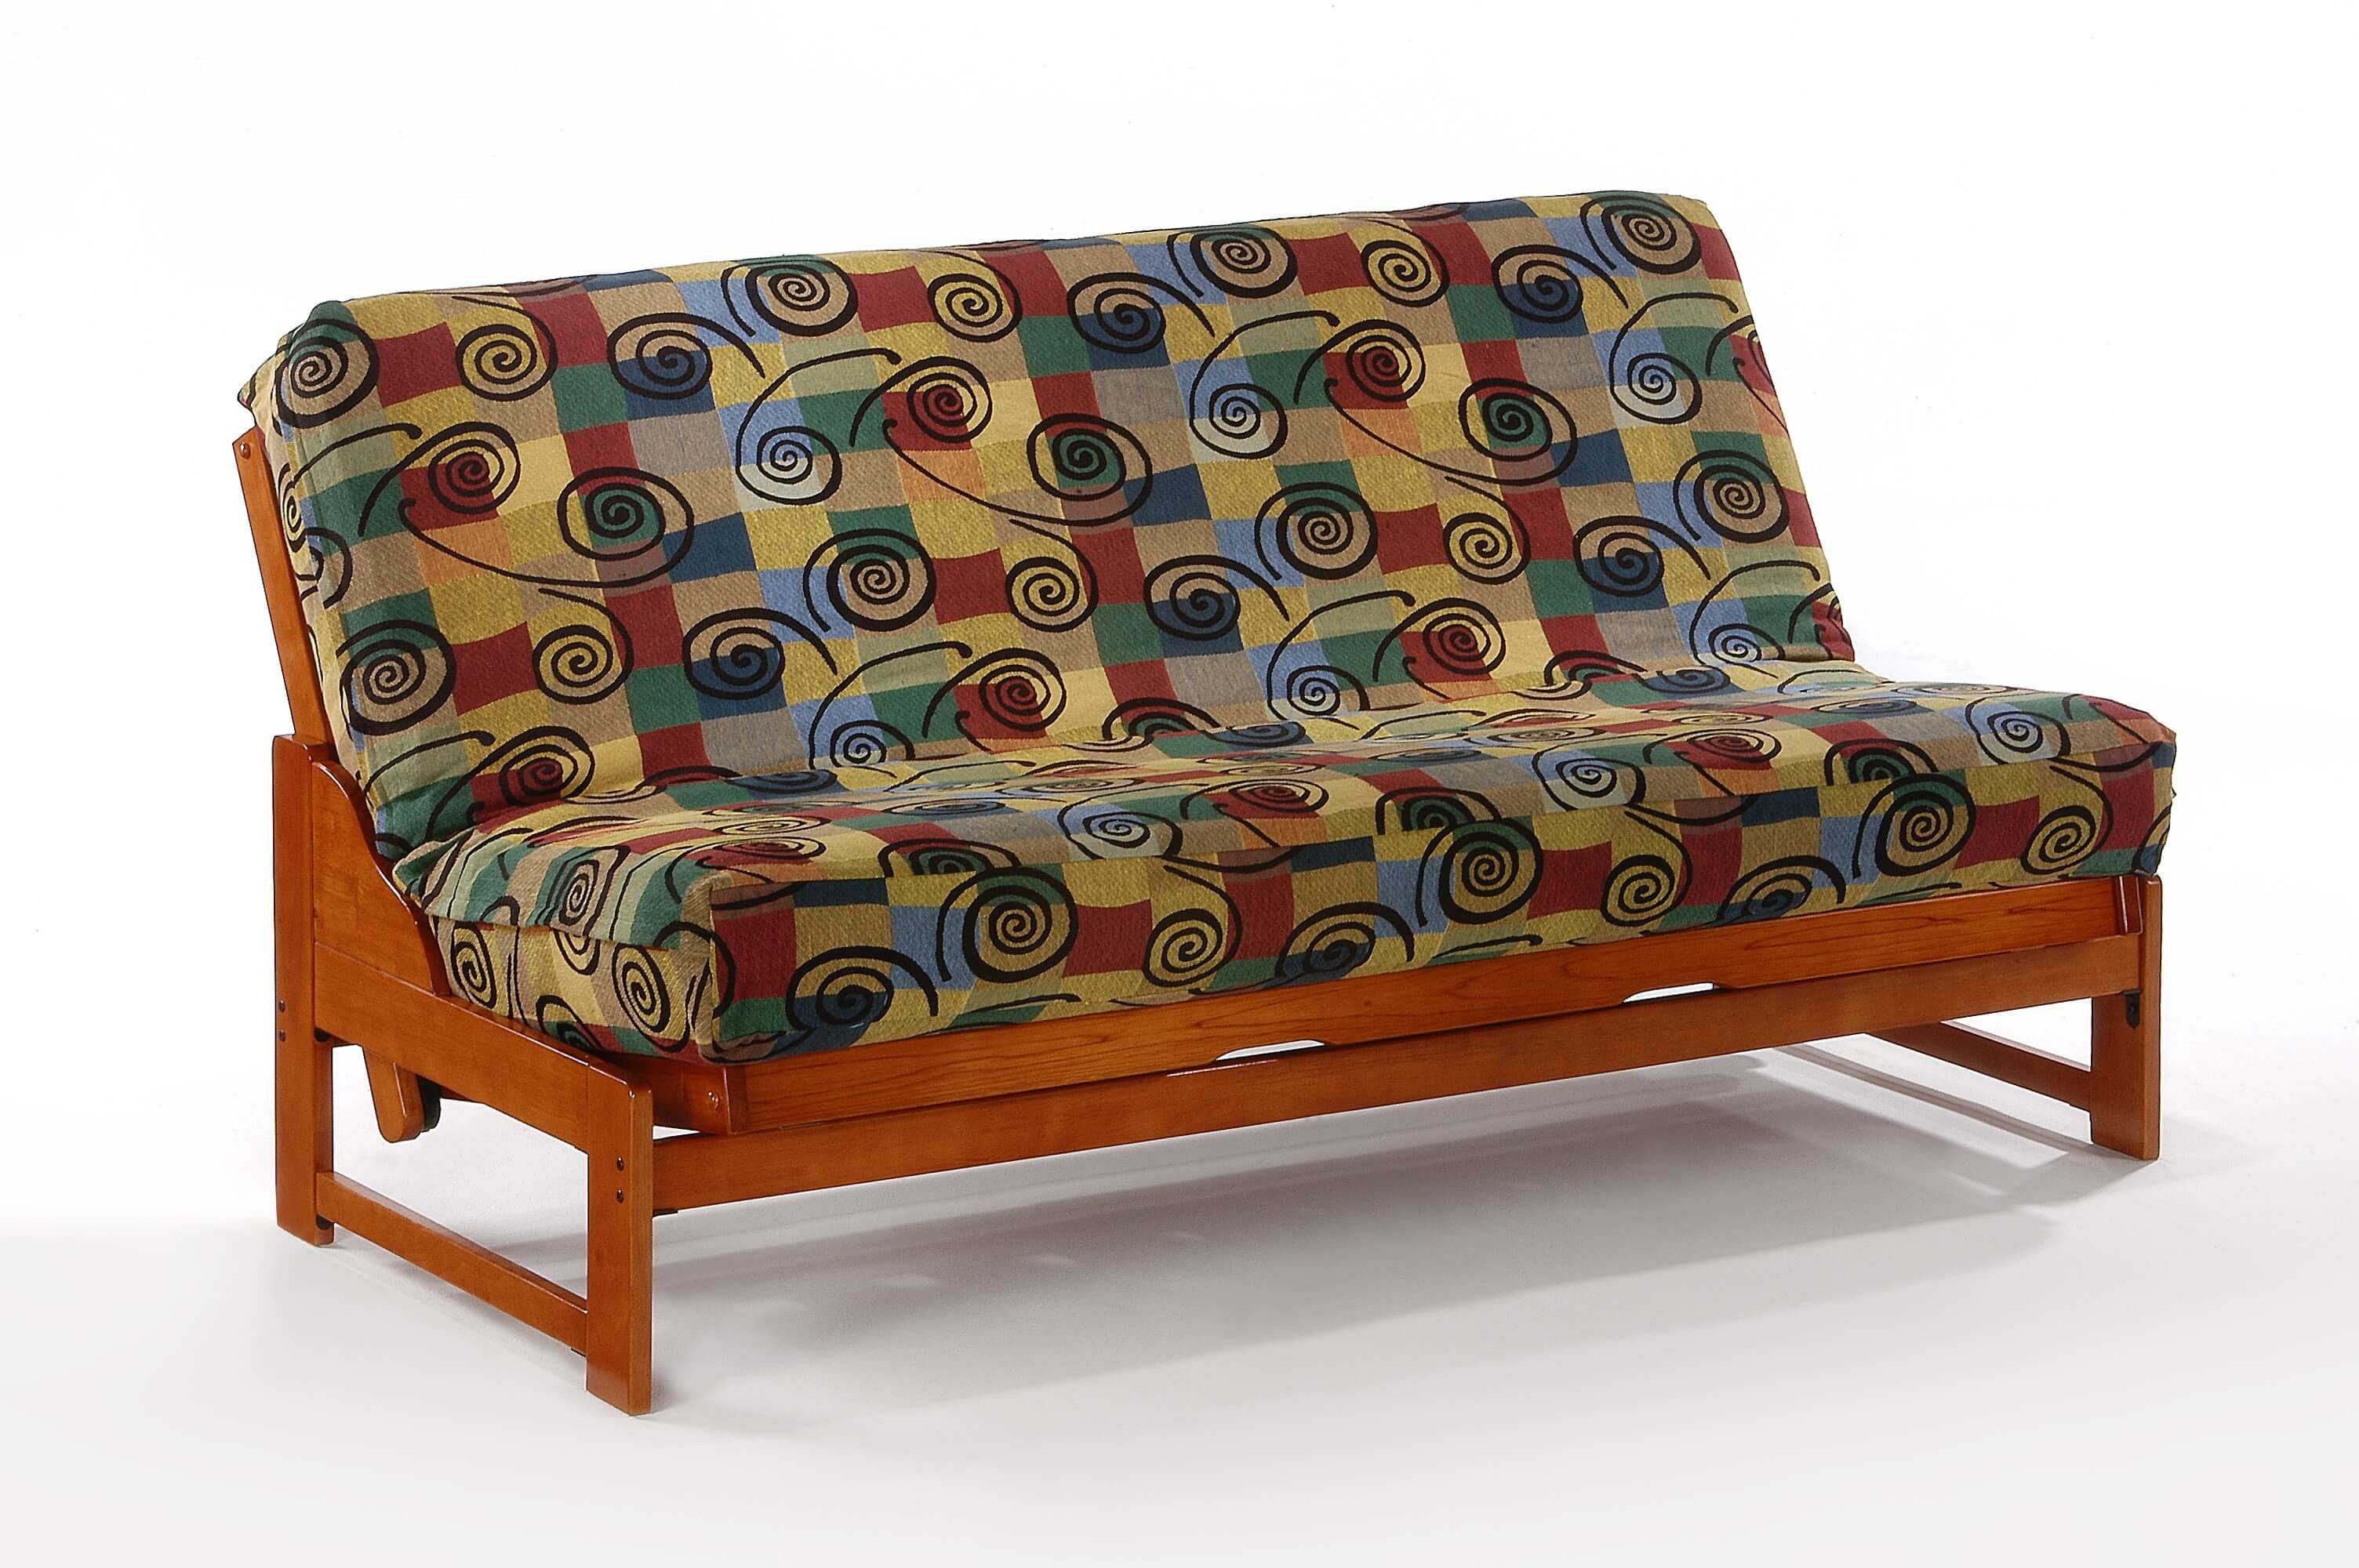 eureka futon eureka futon   bedrooms  u0026 more seattle  rh   bedroomsandmore